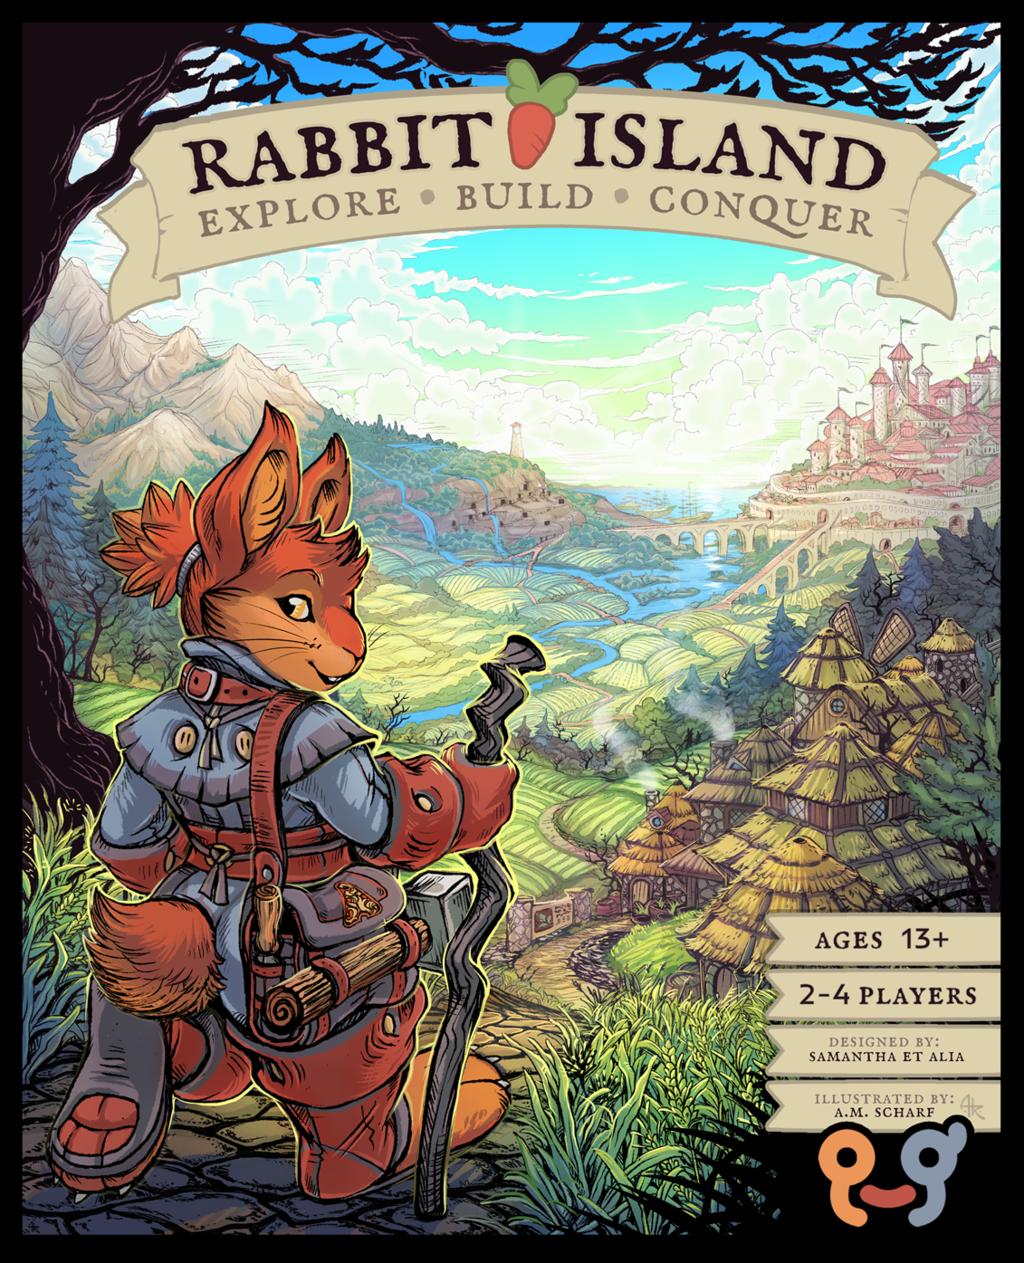 .Rabbit Island - Cover Art.